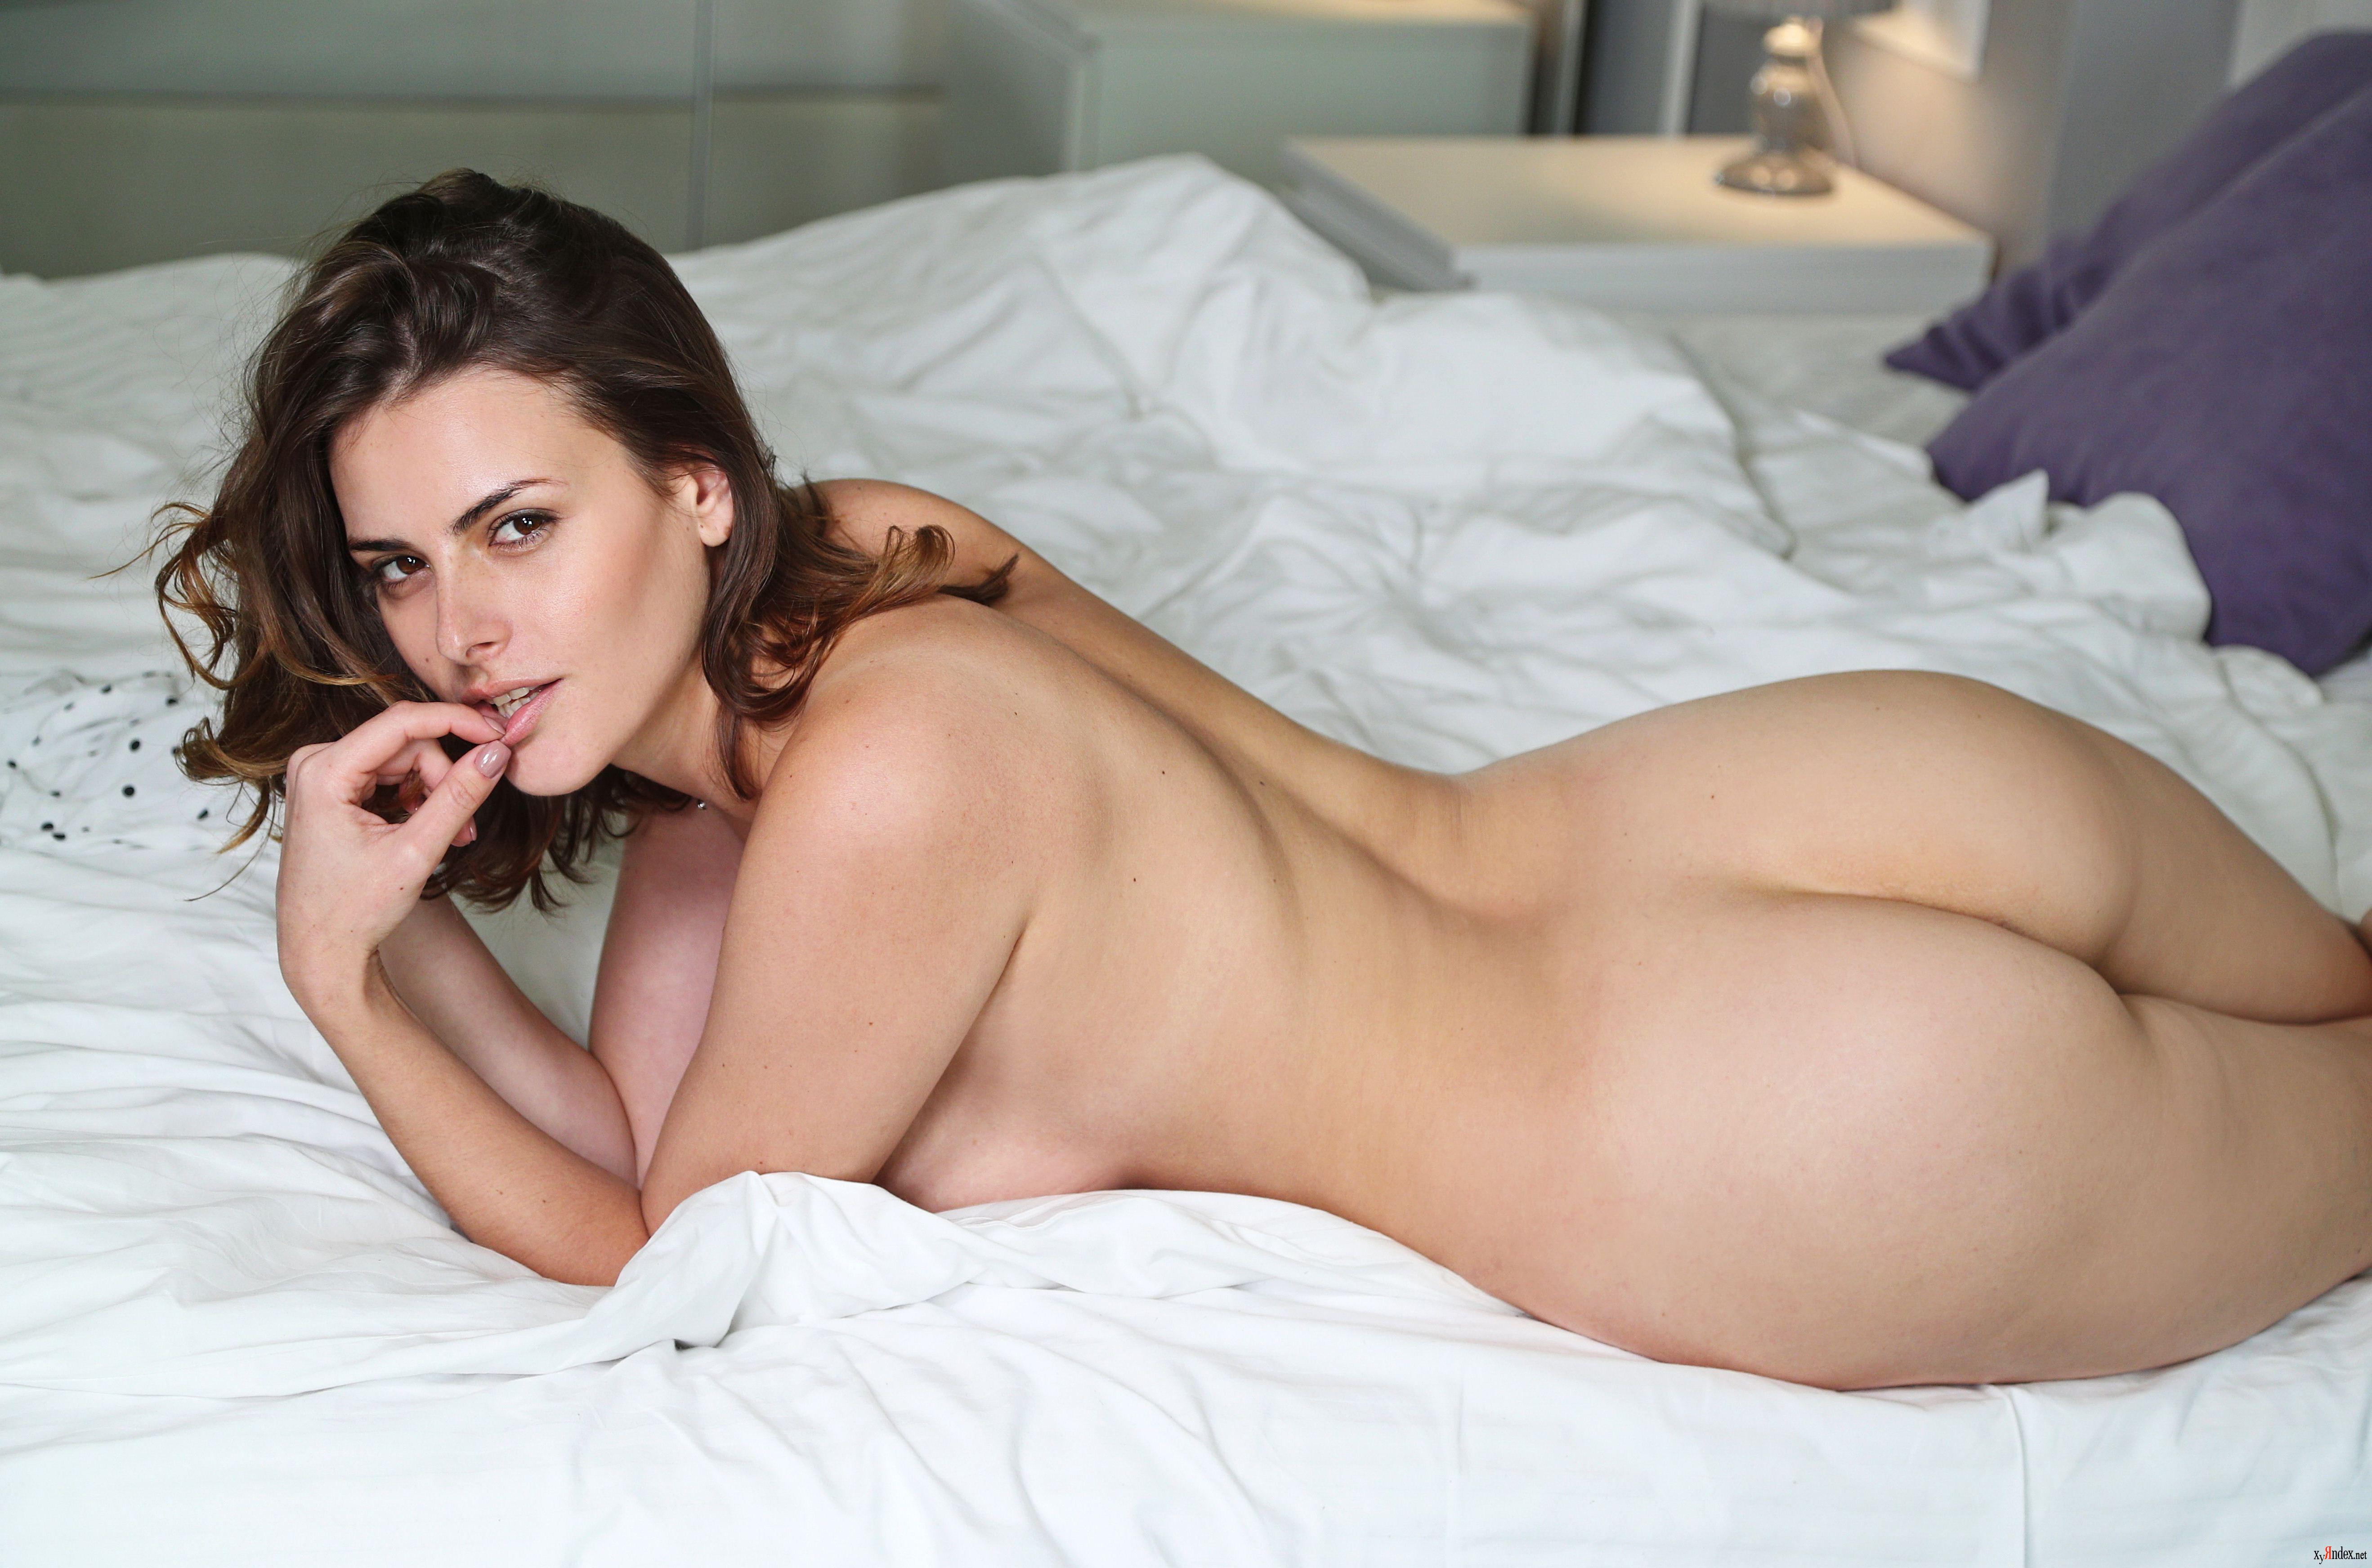 Pornstar pornpics XXX gallery metart evangelina wish sully solo girls review